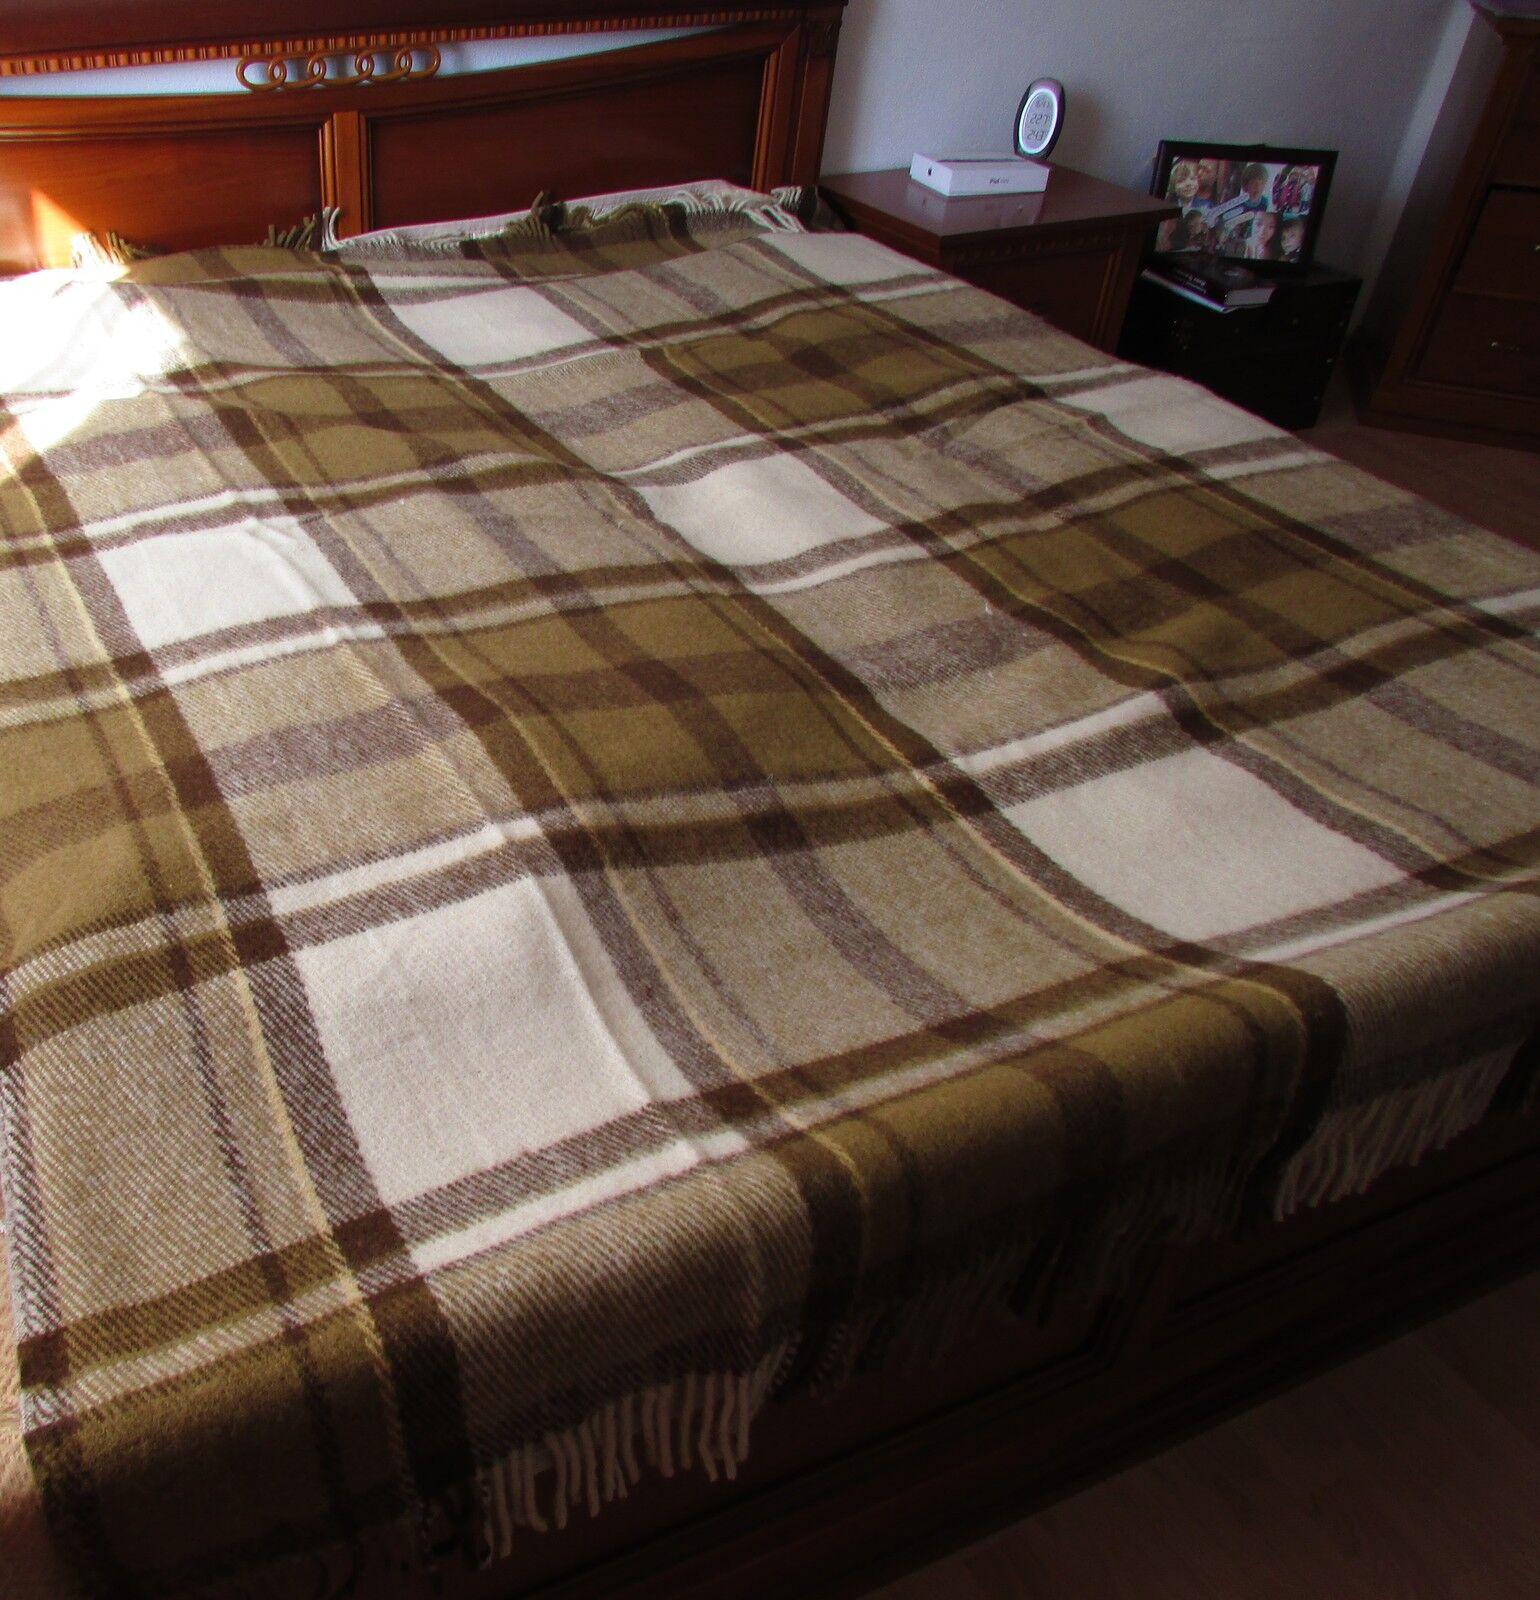 Wollplaid Bettüberwurfdecke Sofaüberwurf Wolldecke 220x260 cm, 100%Wolle